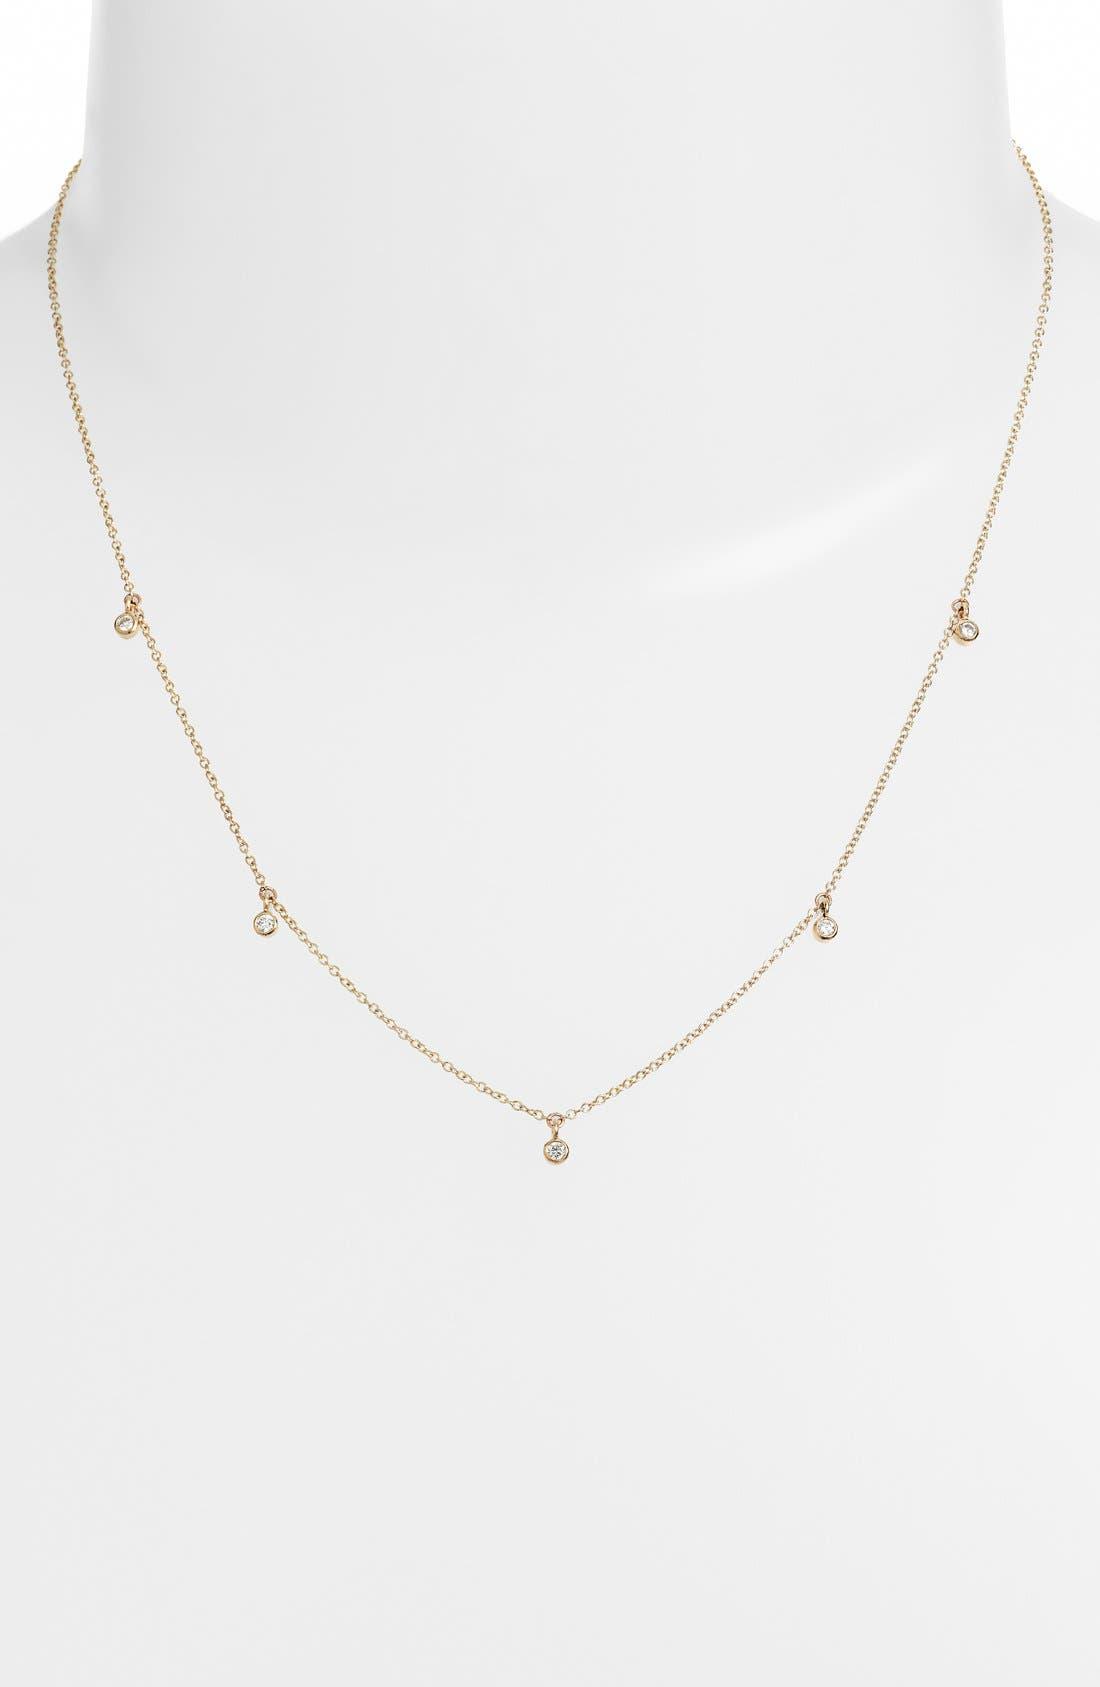 Diamond Strand Necklace,                             Main thumbnail 1, color,                             710